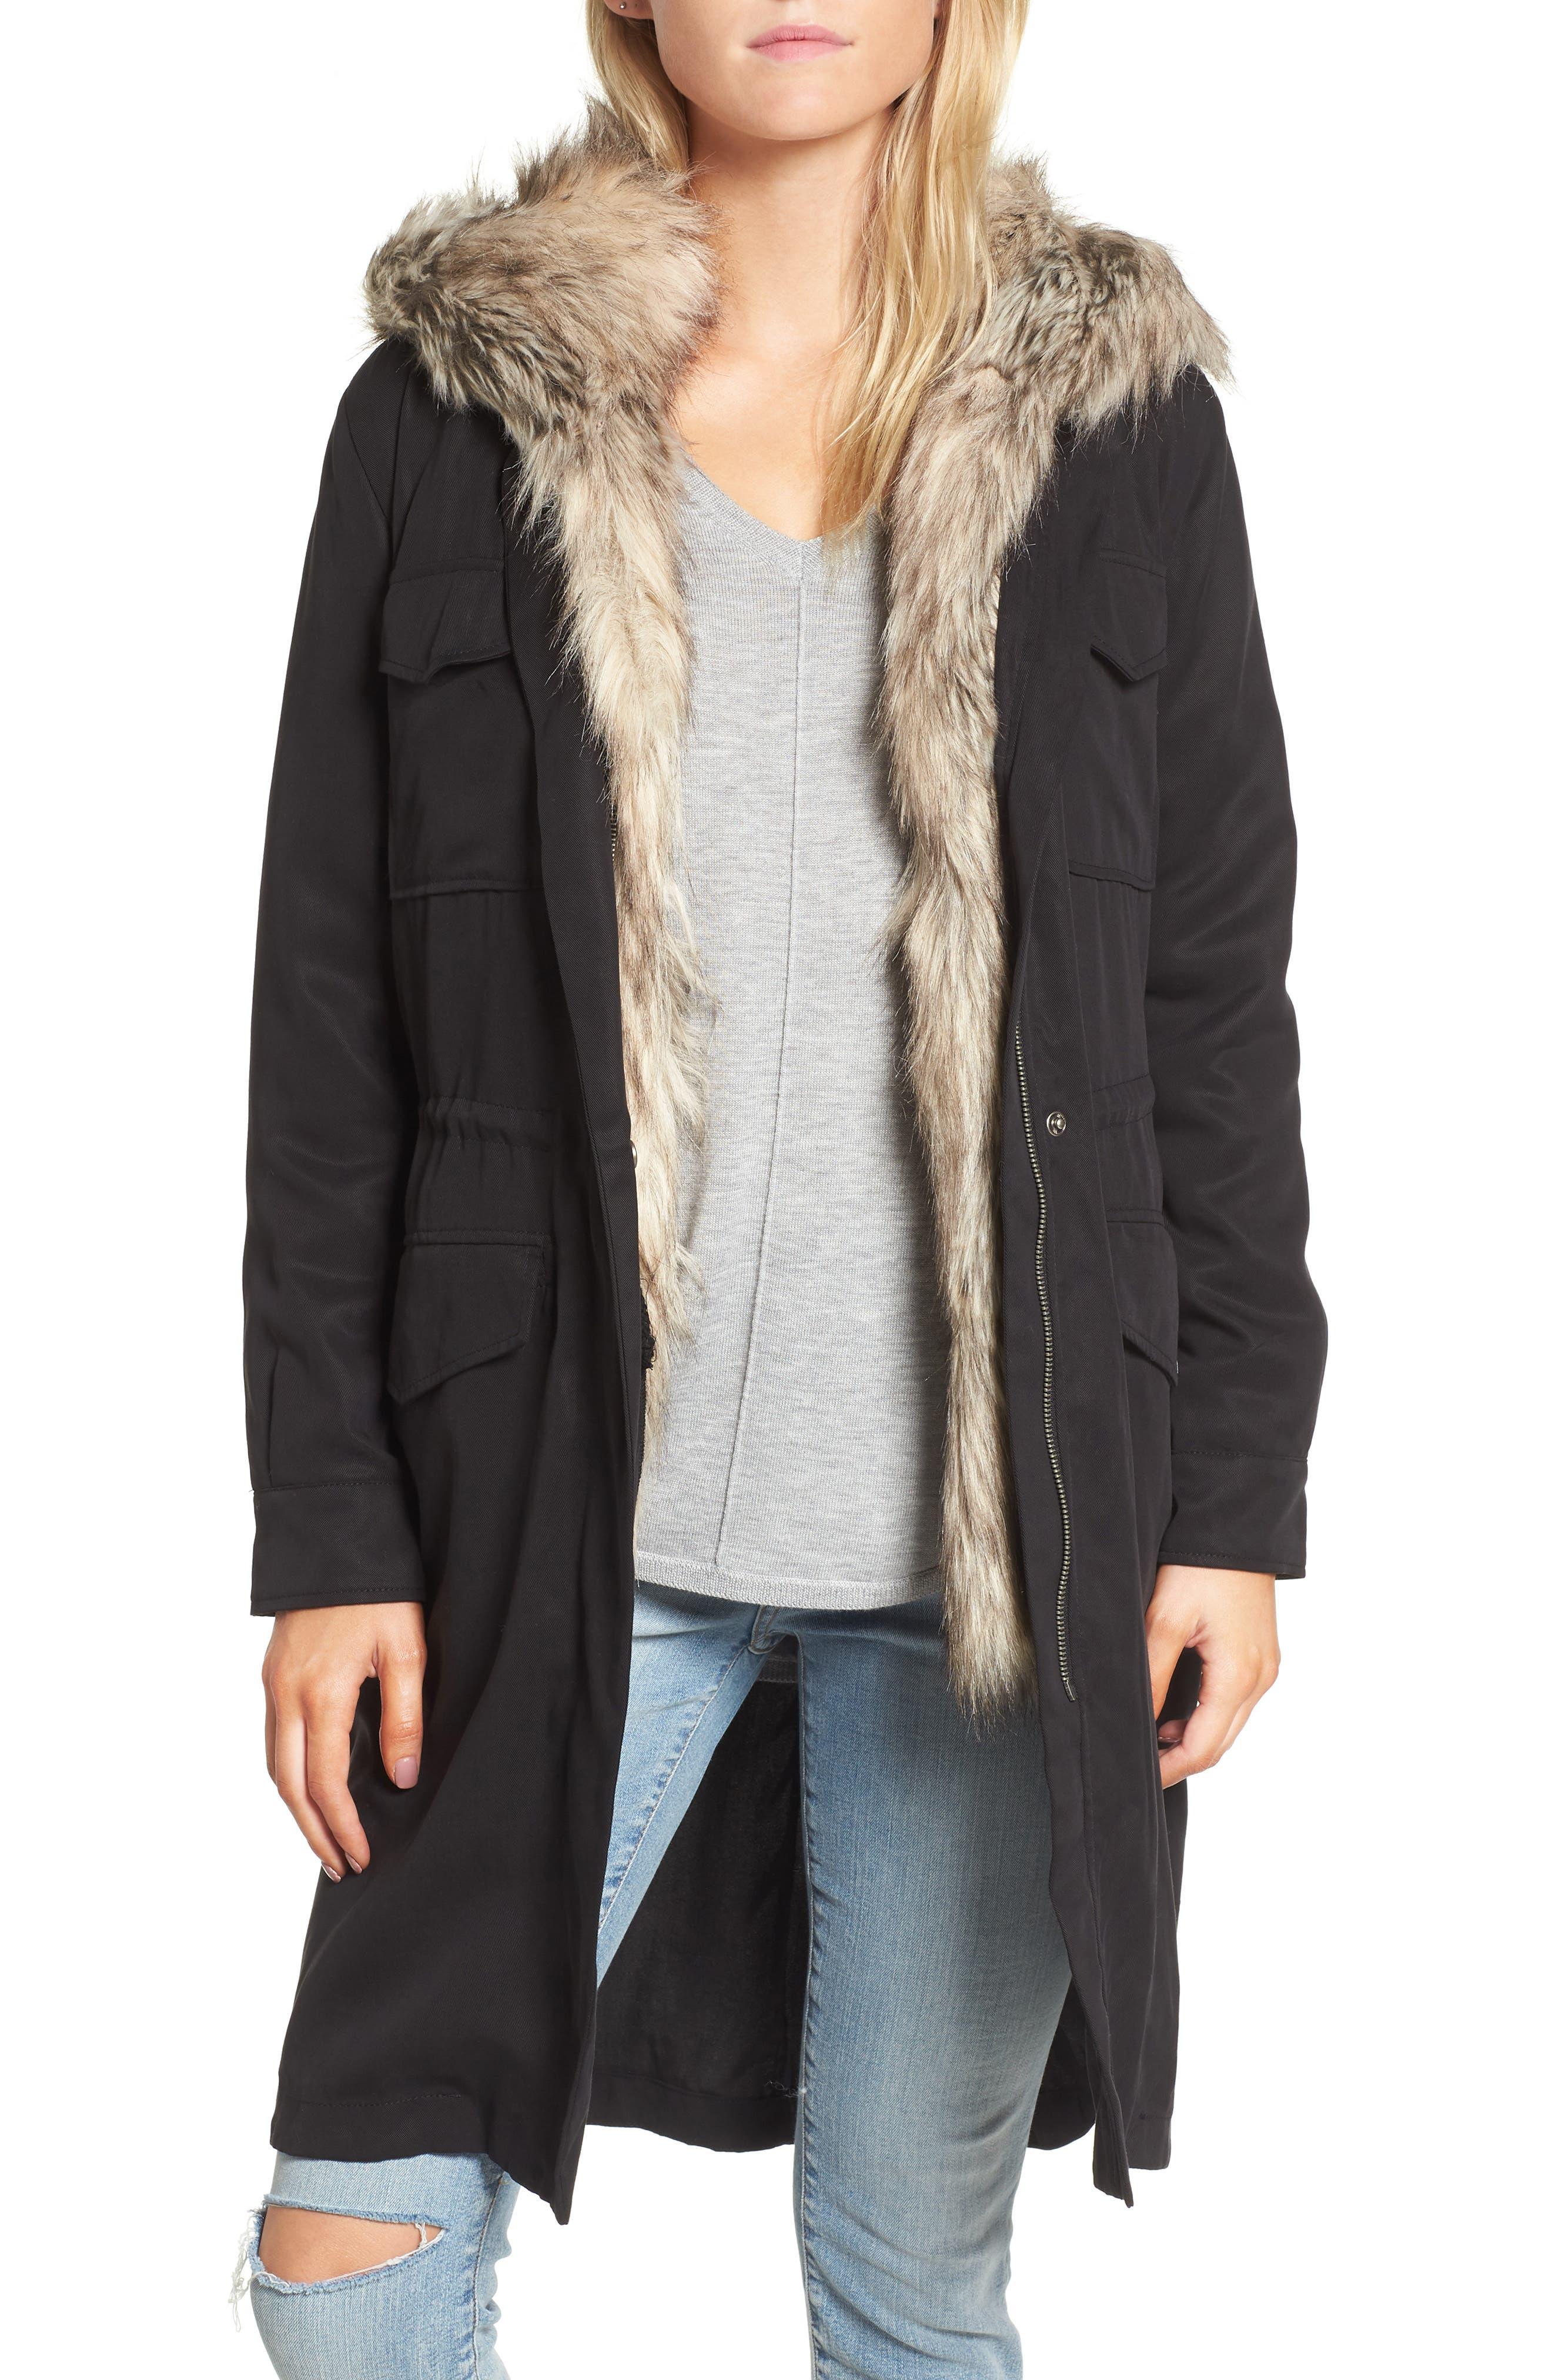 Walsh Tencel<sup>®</sup> Coat with Detachable Hooded Faux Fur Vest,                             Main thumbnail 1, color,                             001